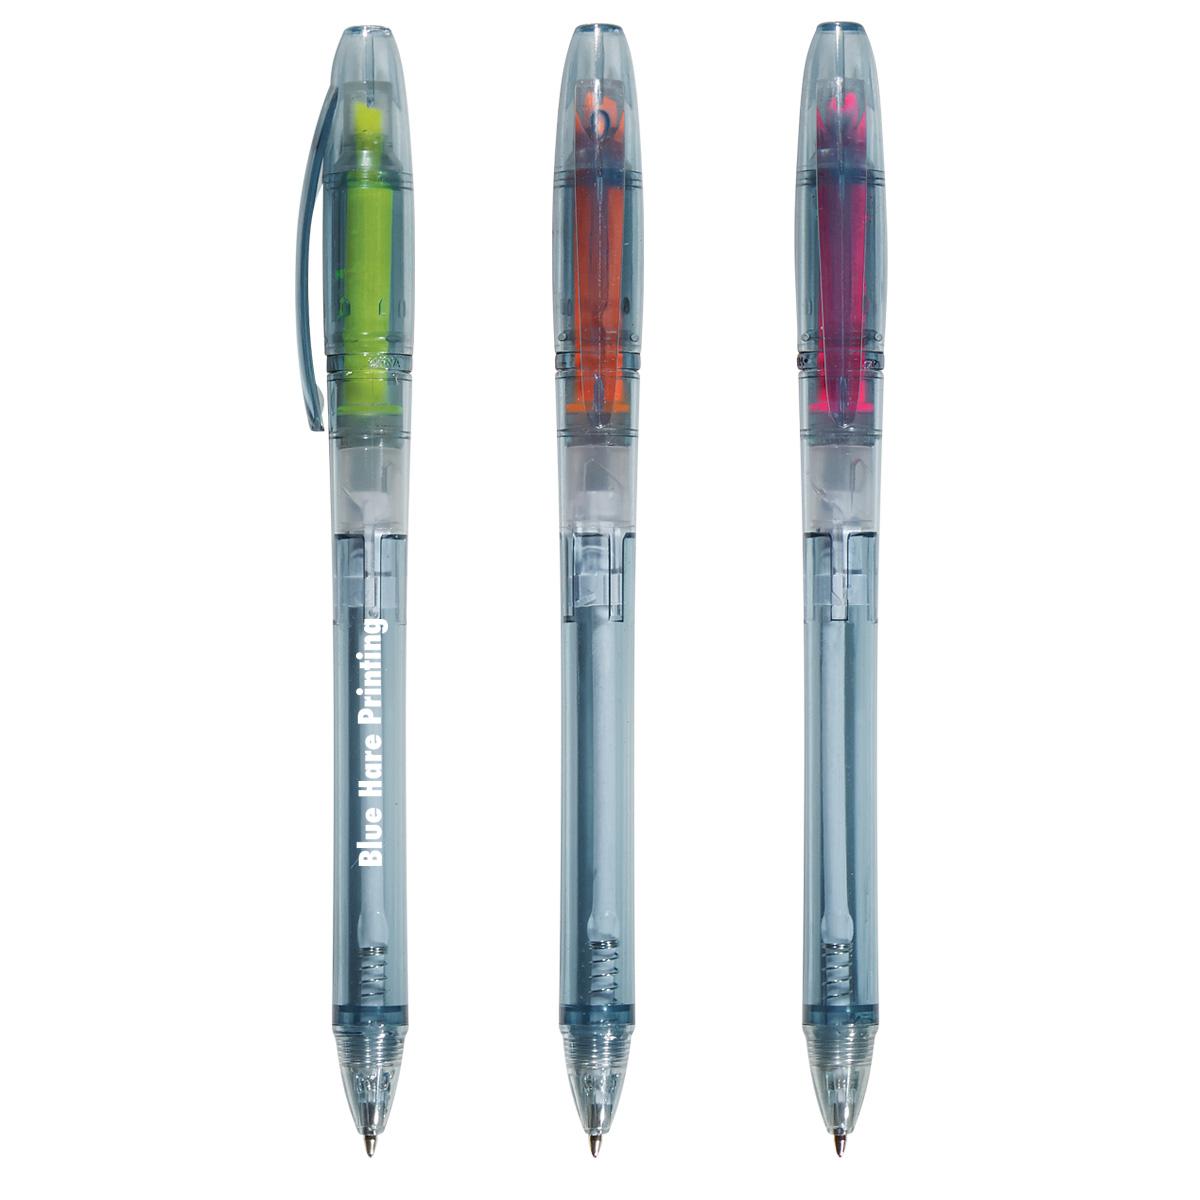 545268905-816 - Oasis Bottle-Inspired Pen With Highlighter - thumbnail